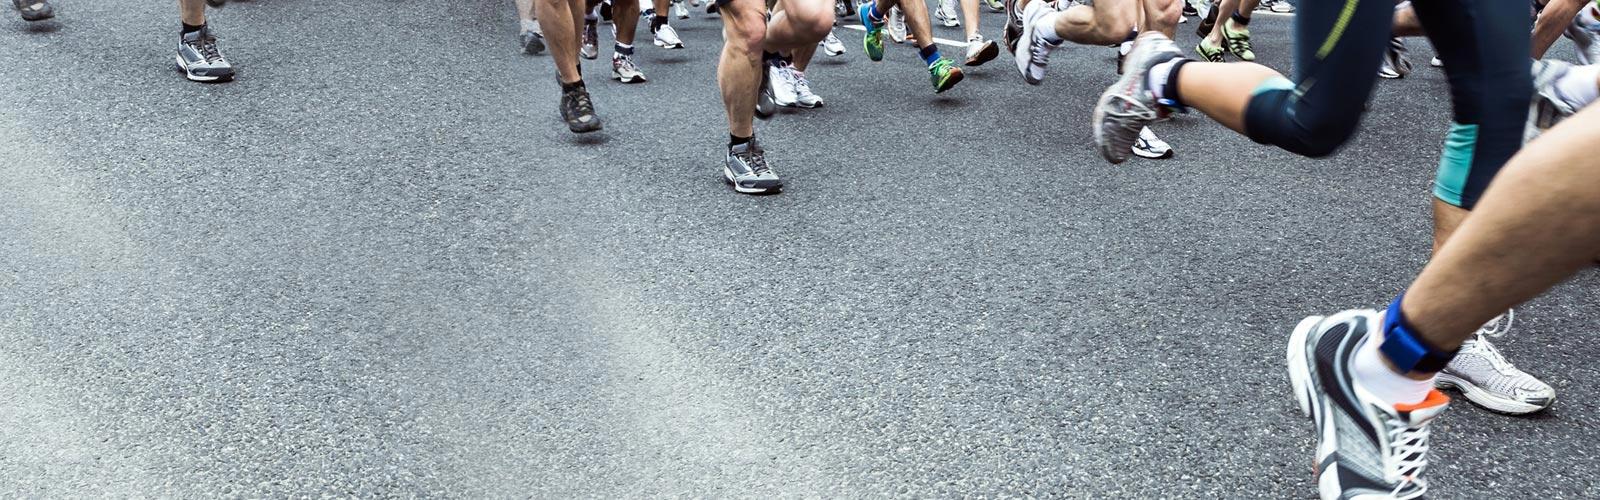 TRF Boston Marathon 2015